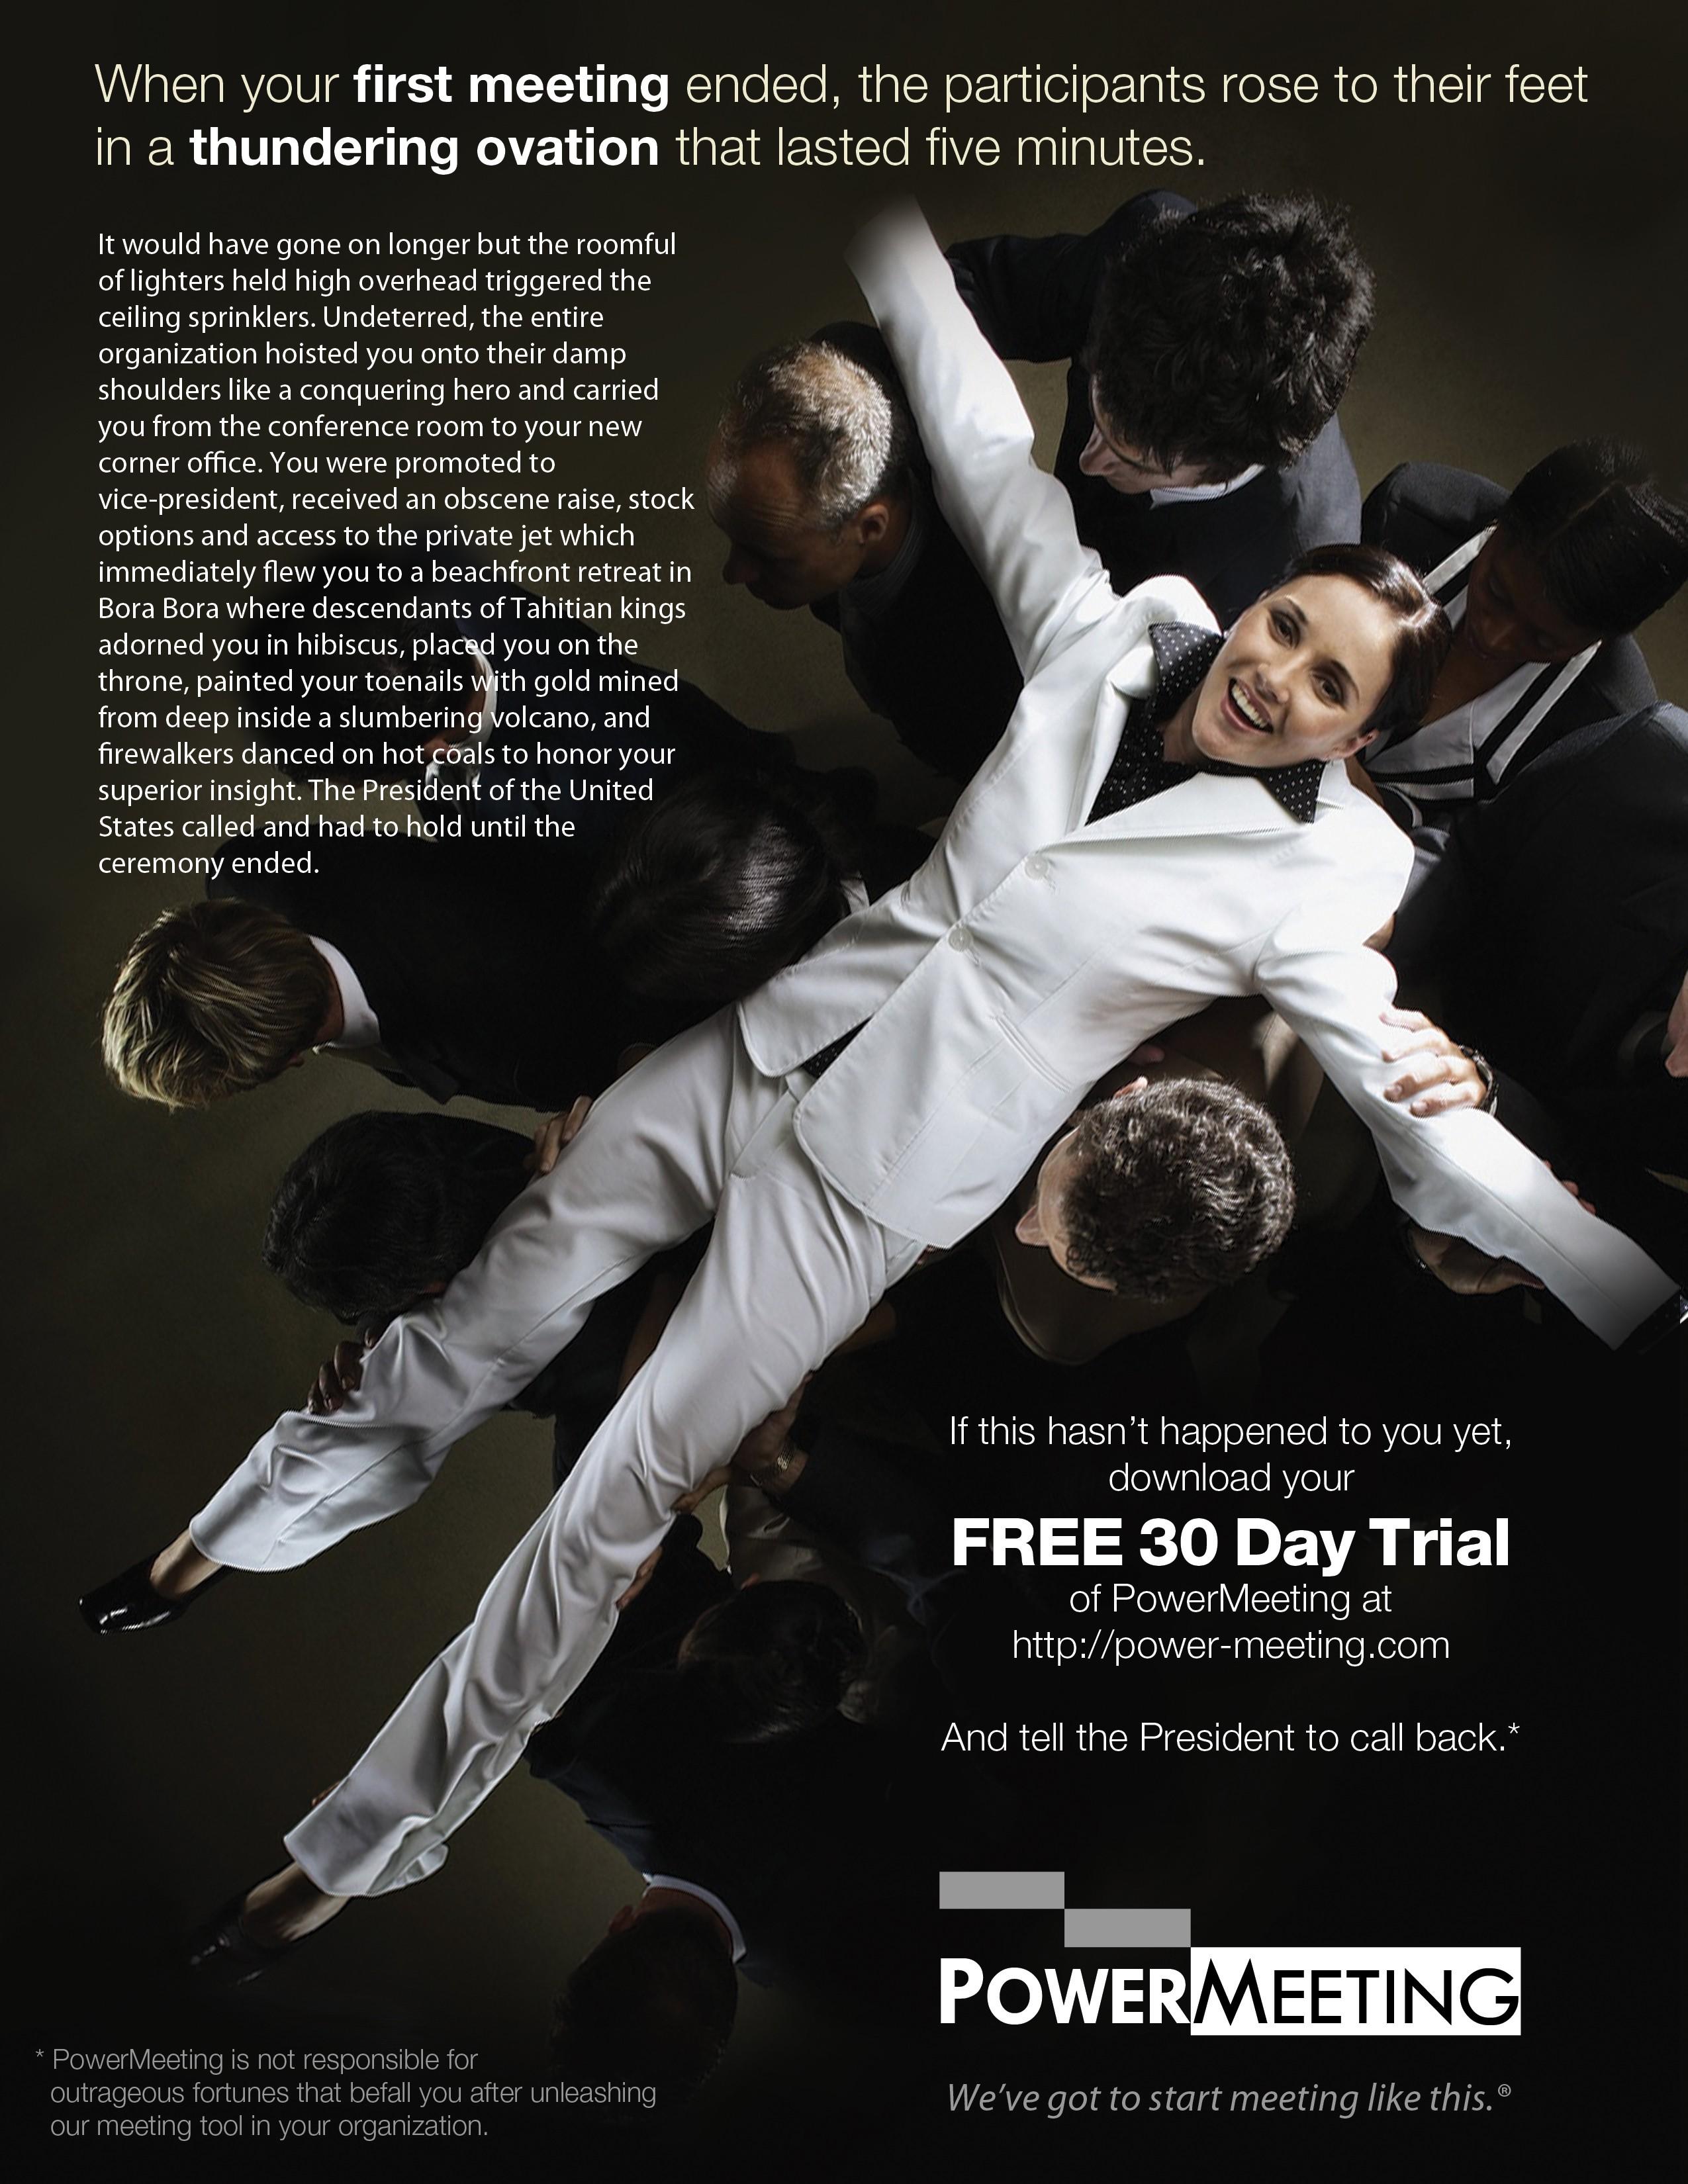 PowerMeeting Full Page Magazine Ad